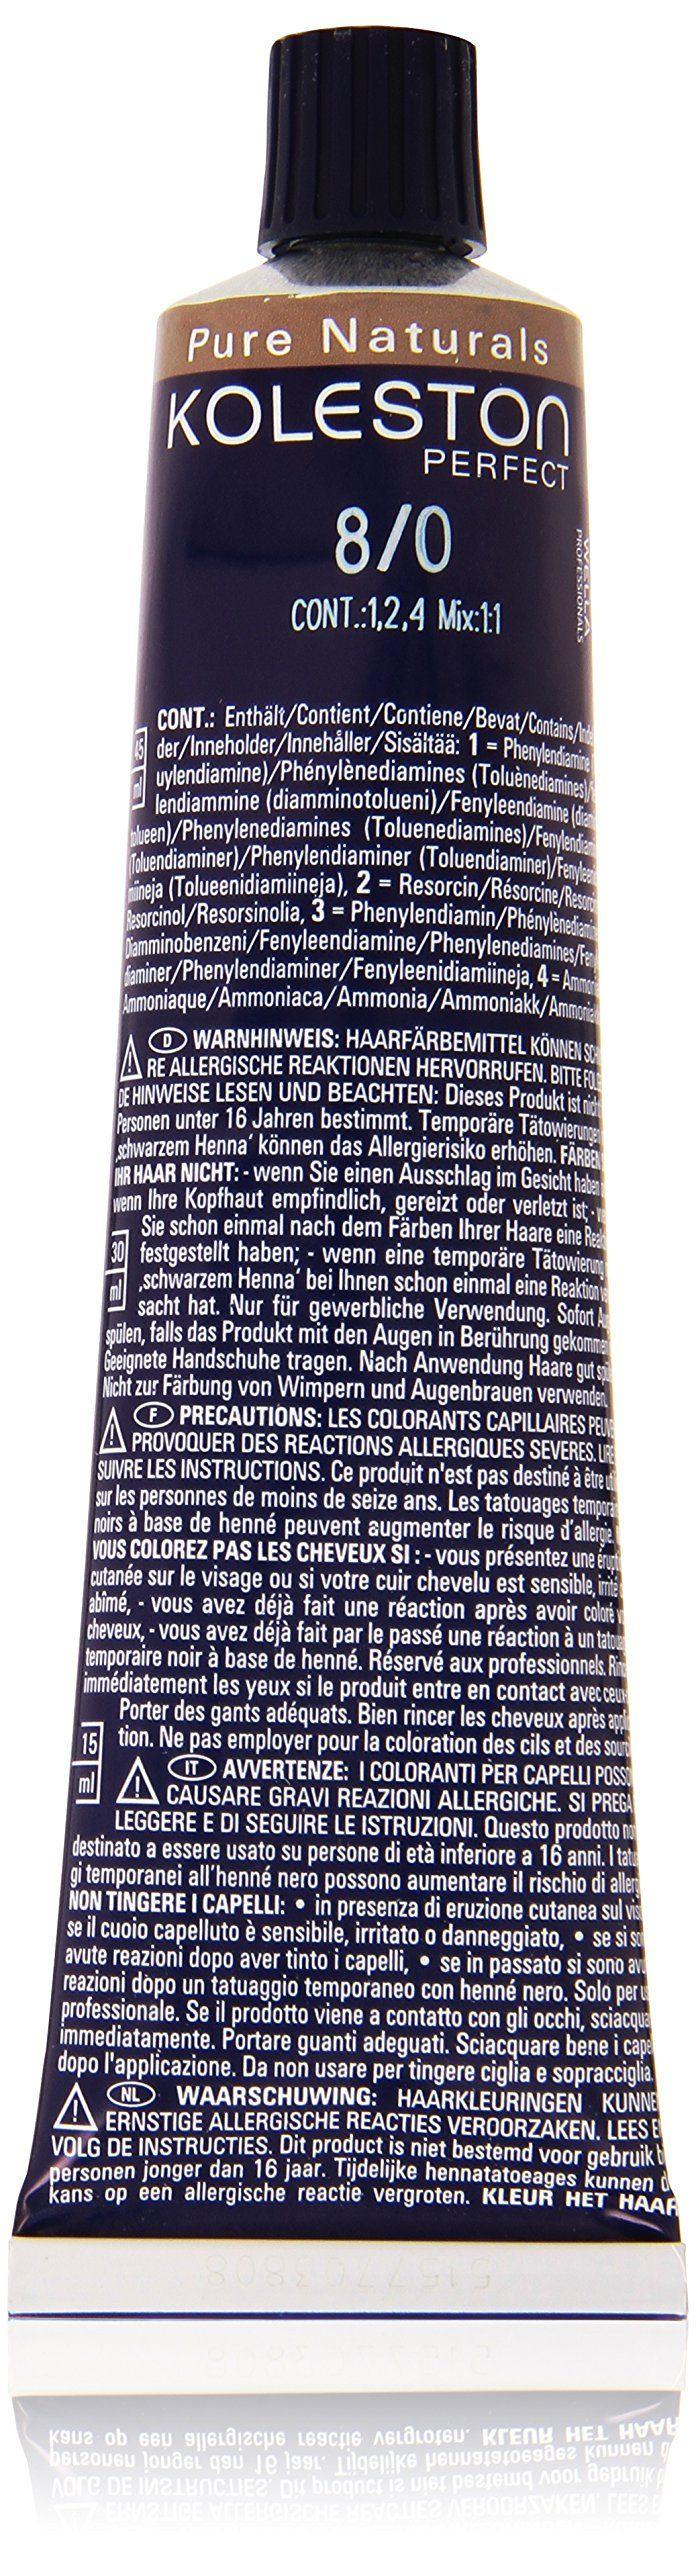 Wella KOLESTON PERFECT 8/0 60 ml. Buy Online Wella KOLESTON PERFECT 8/0 60 ml This product is 100% original with EAN code. (European Article Number) .